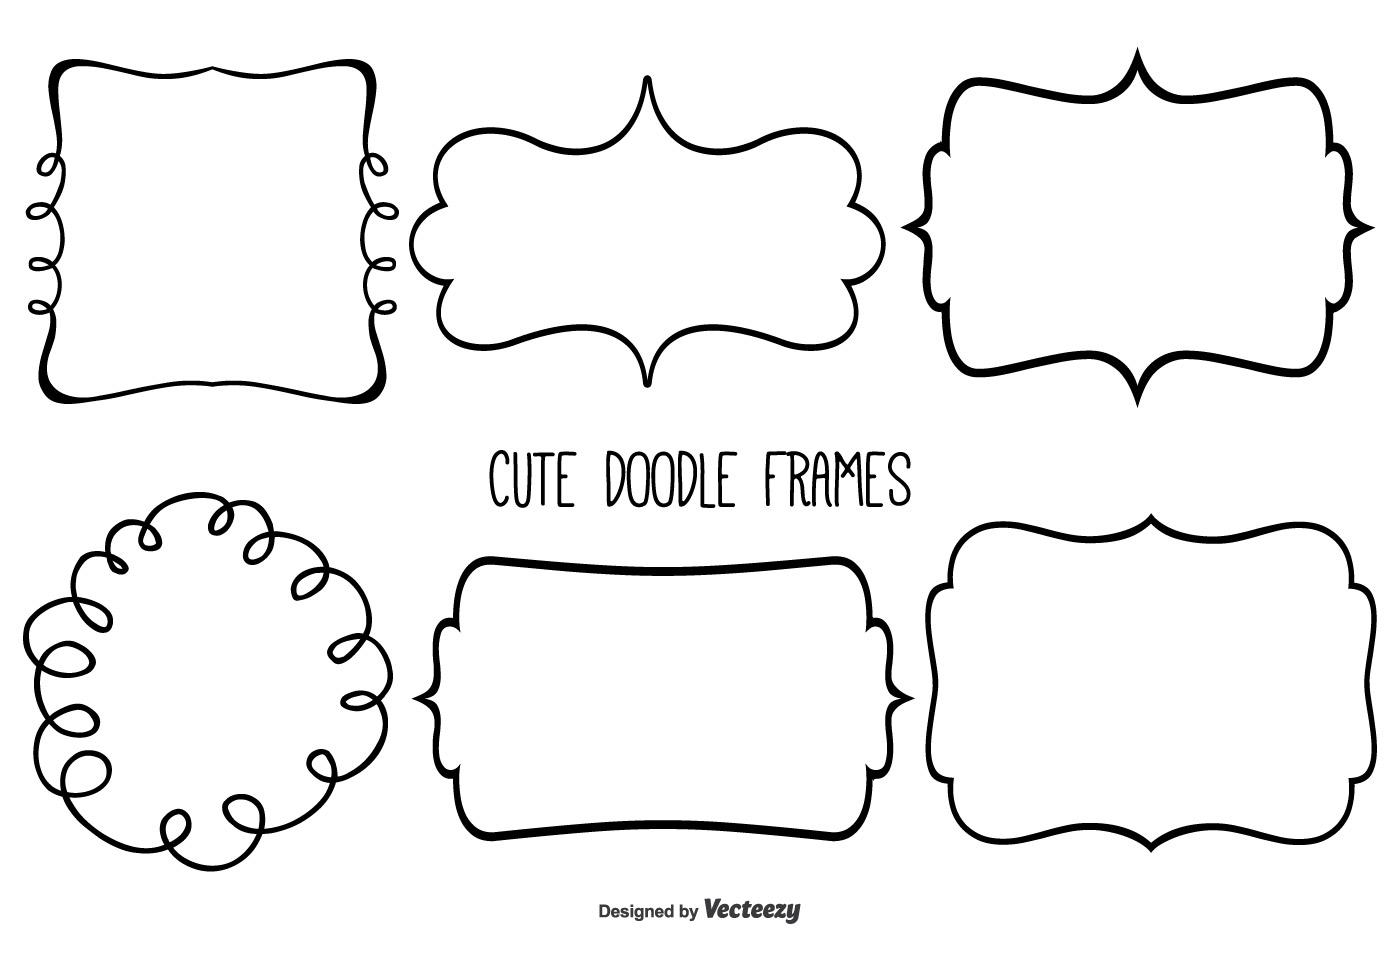 Cute Doodle Frame Set - Download Free Vector Art, Stock Graphics ...